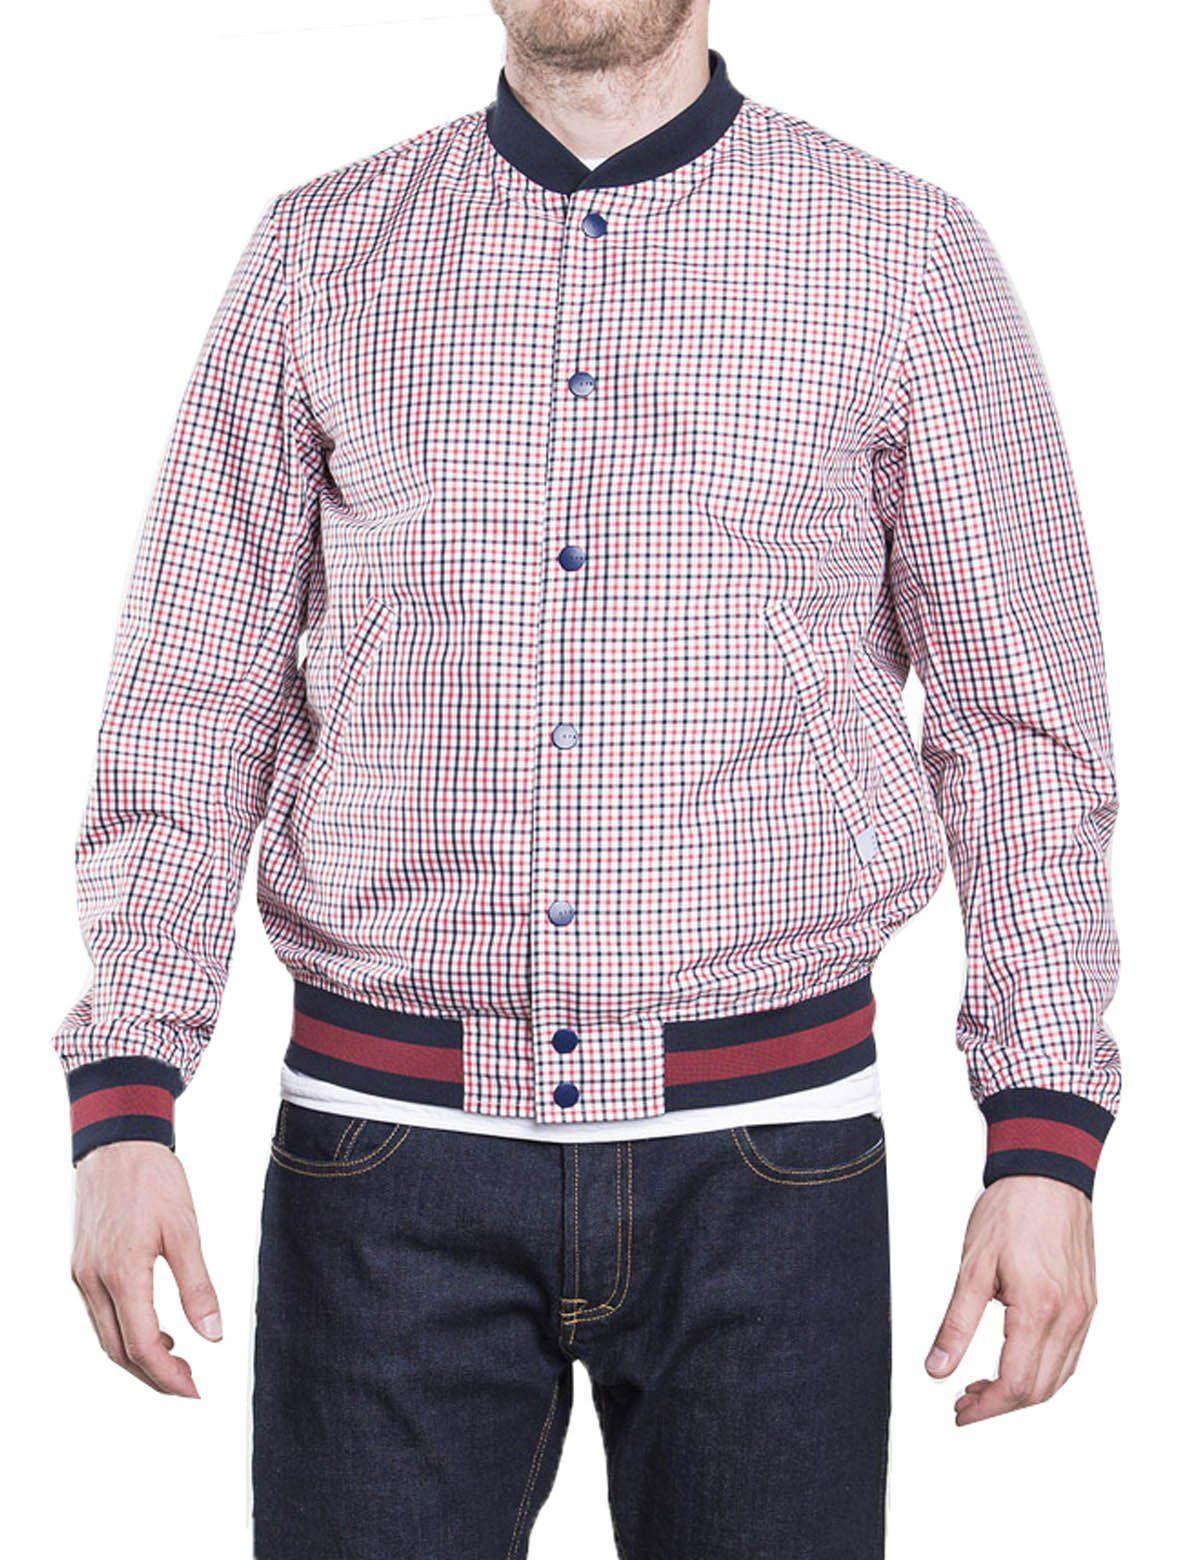 quality best wholesaler really comfortable Men Golf Clothing - CIVICO 76 Mens Varsity Bomber Jacket Plaid ...